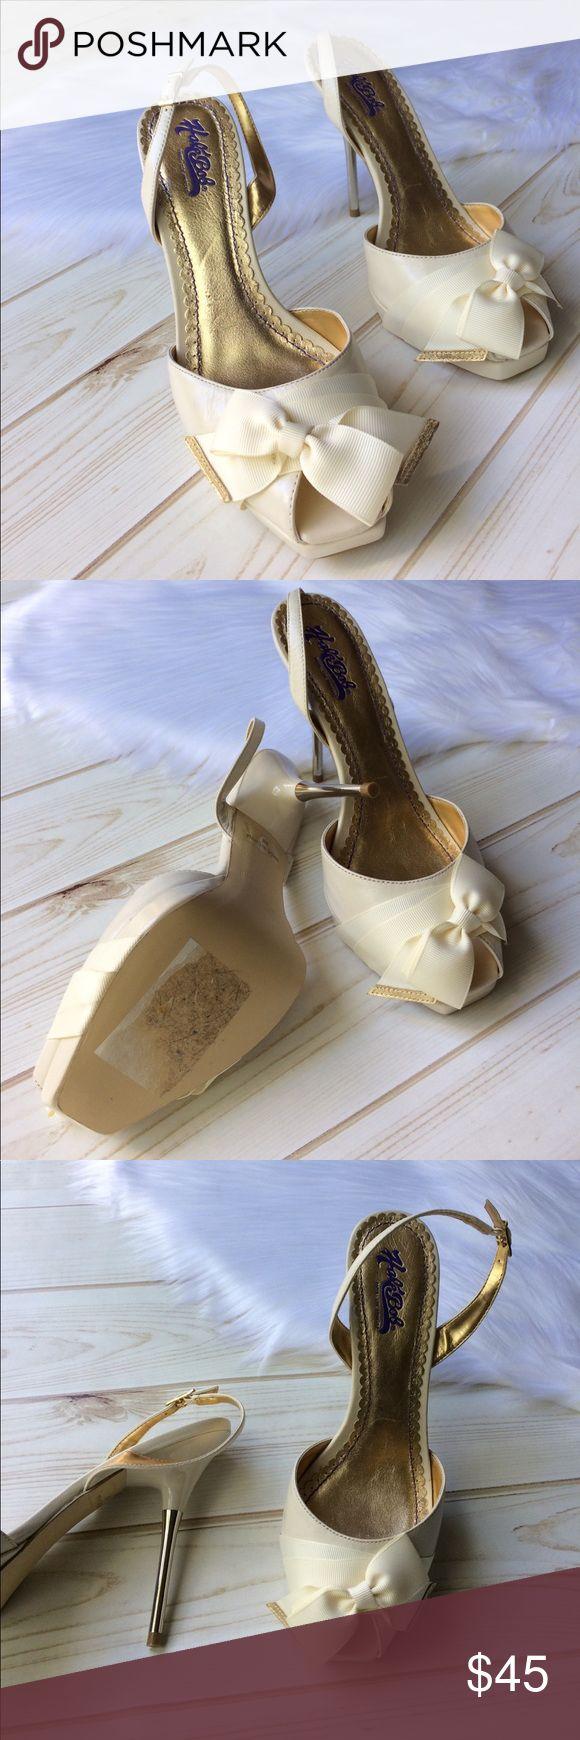 "Hale Bob Vero cuoio high heels Brand new. Never worn. Hale Bob sz 8. Ivory cream color. Beautiful & classy🙂 pumps high  heels, 5"" high. Vero Cuoio Hale Bob shoes high heels. Hale Bob Shoes Heels"